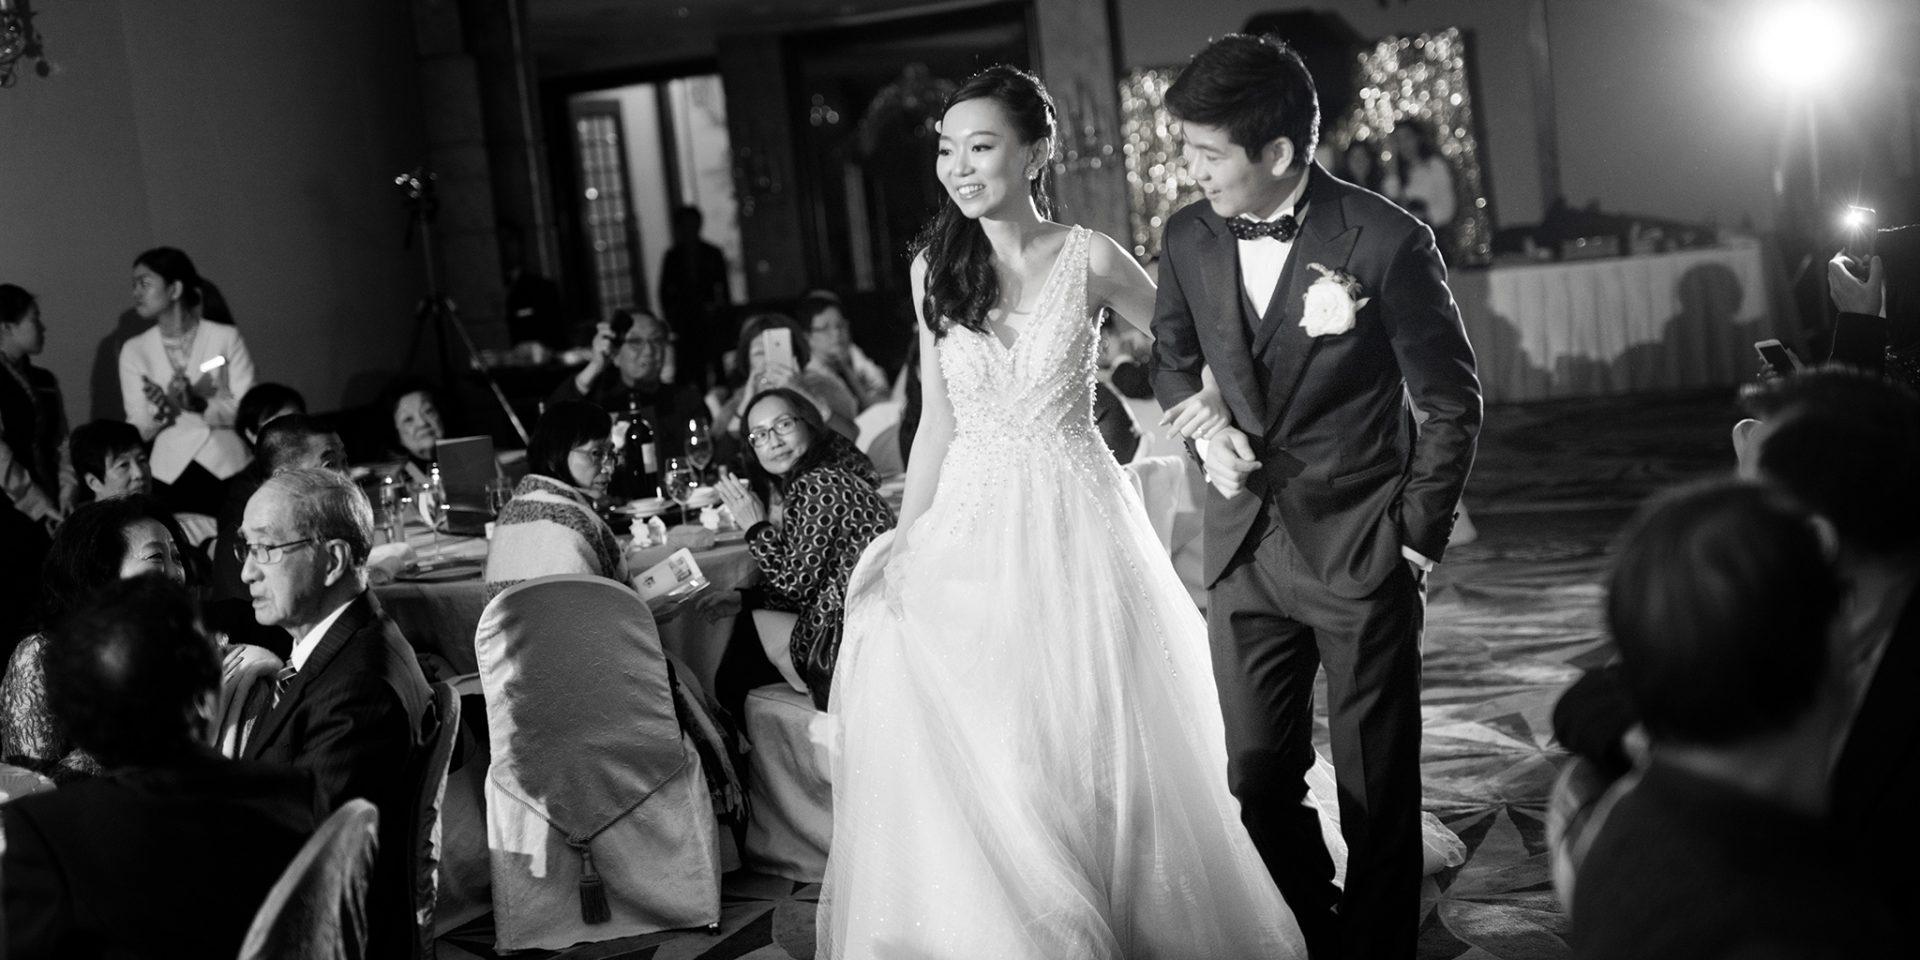 wedding_hk_53